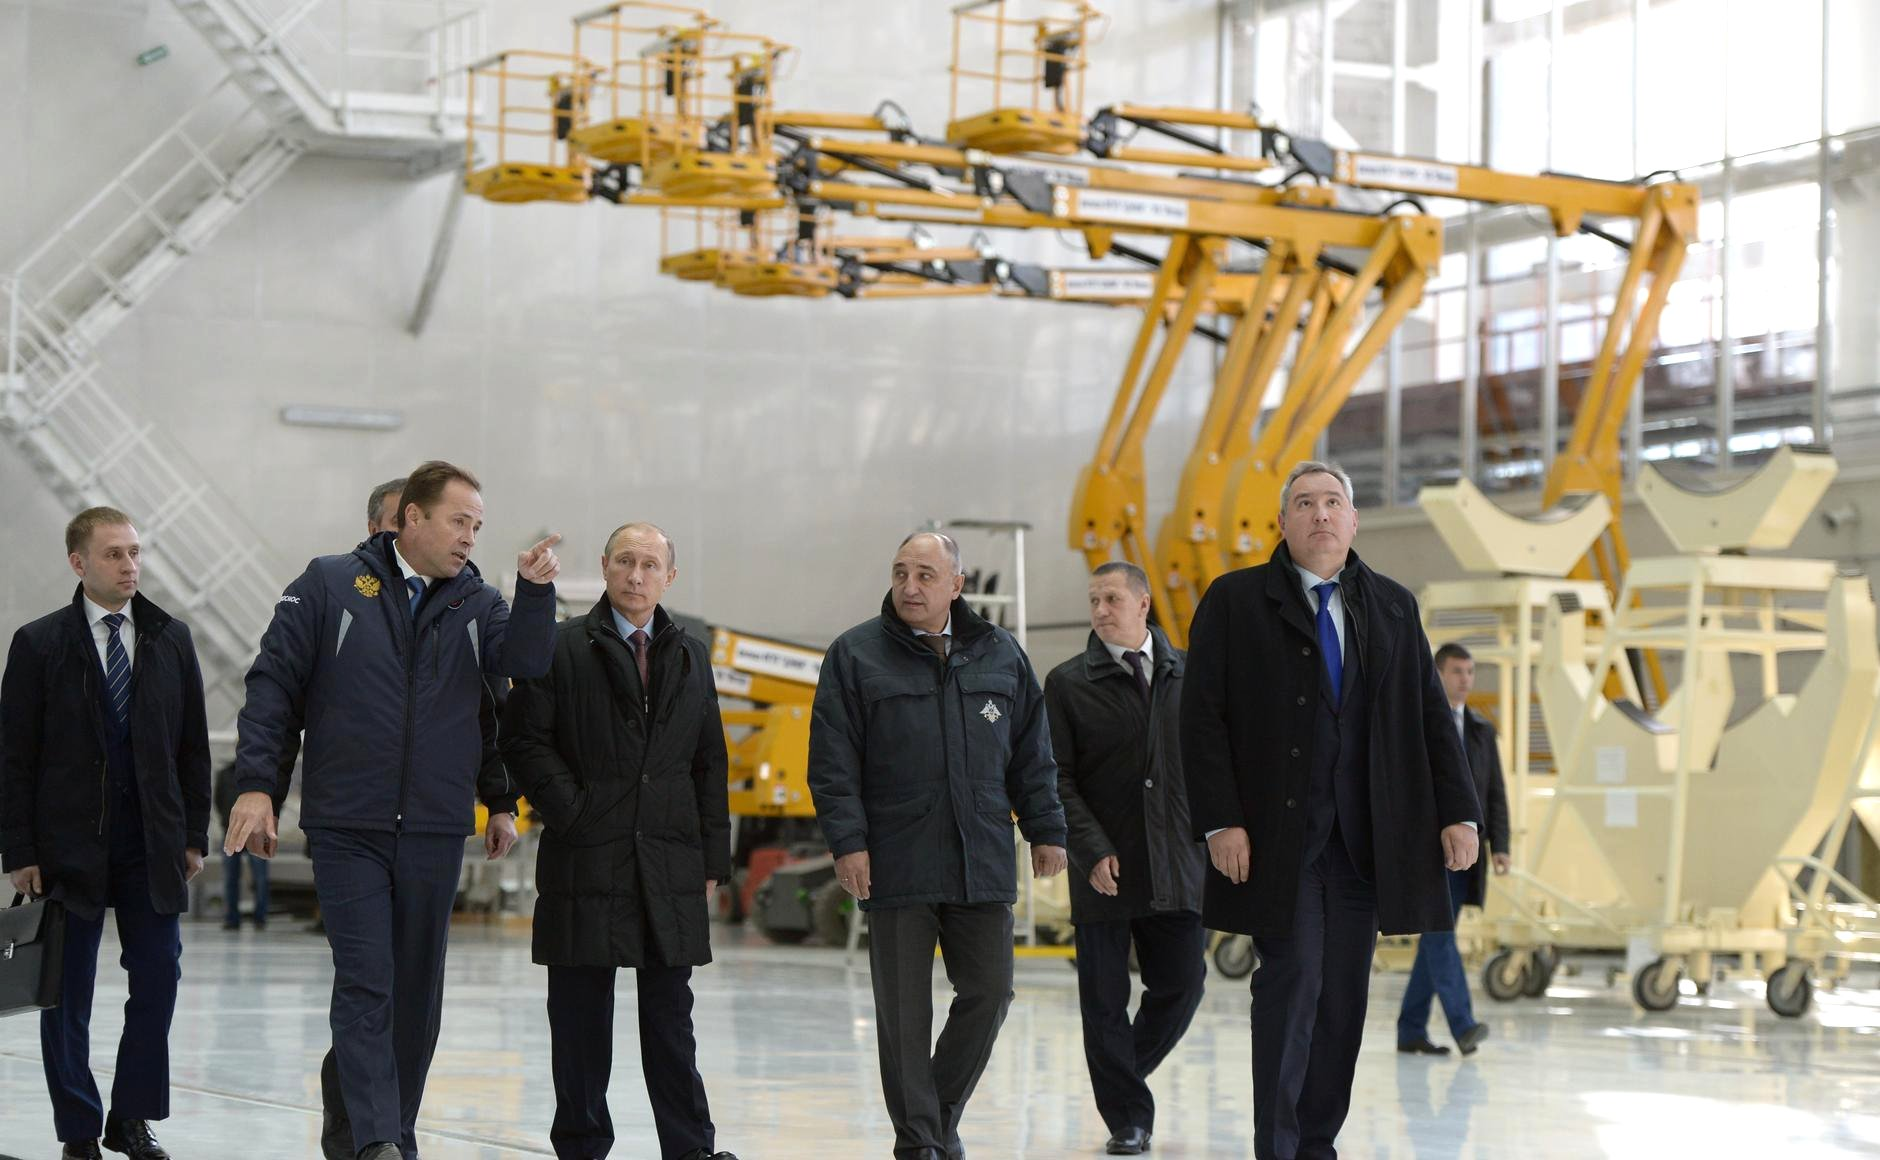 Vladimir_Putin_in_Vostochny_Cosmodrome_(2015-10-14)_2